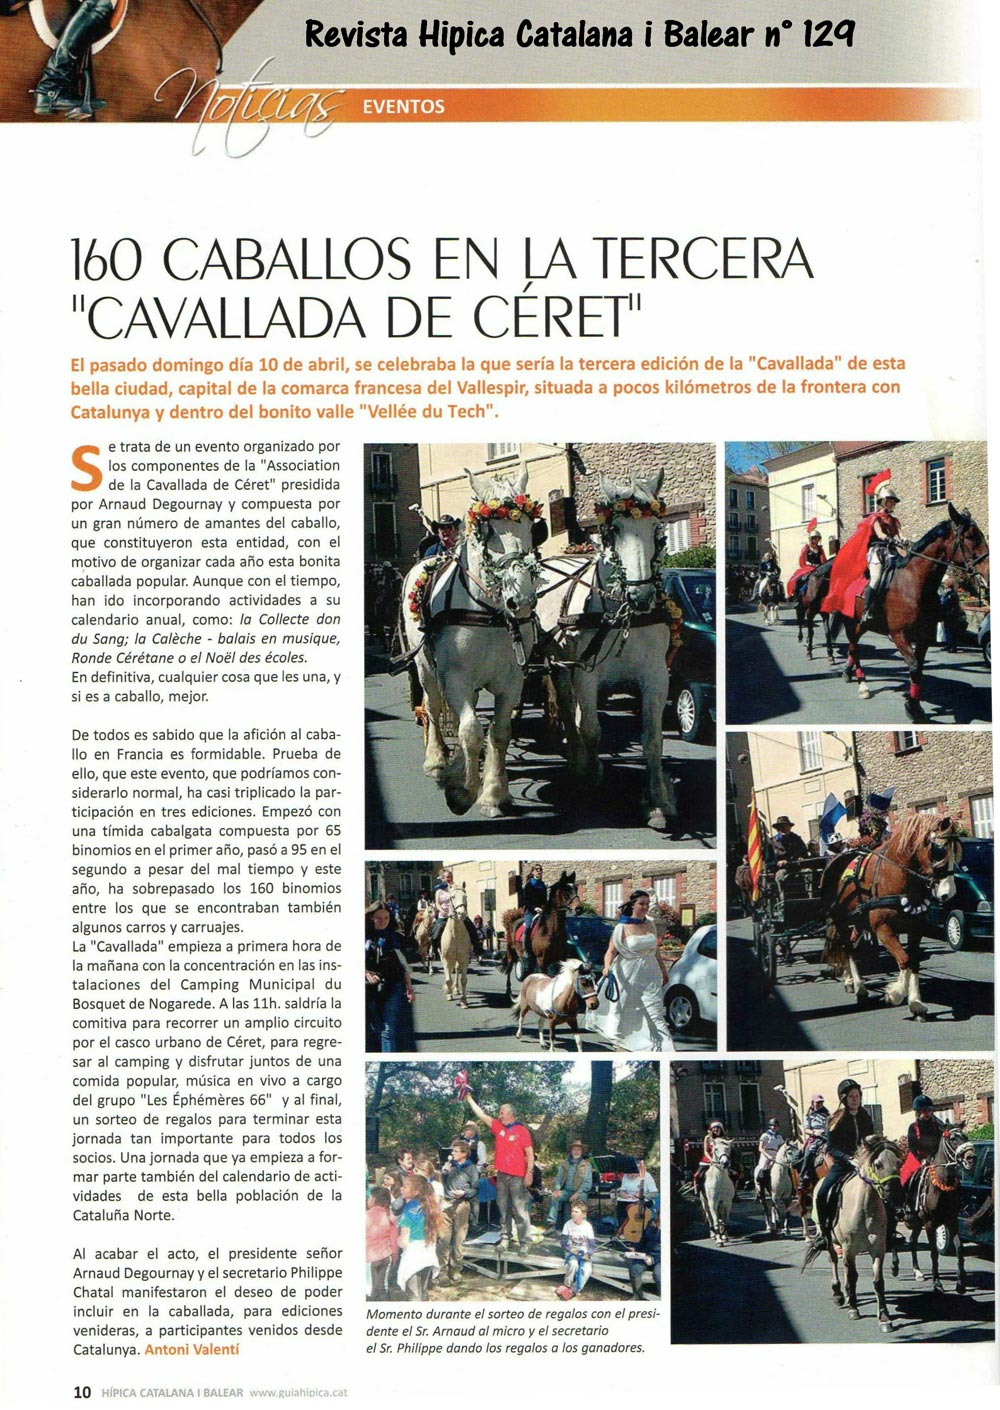 Revista hipica i balear n° 129